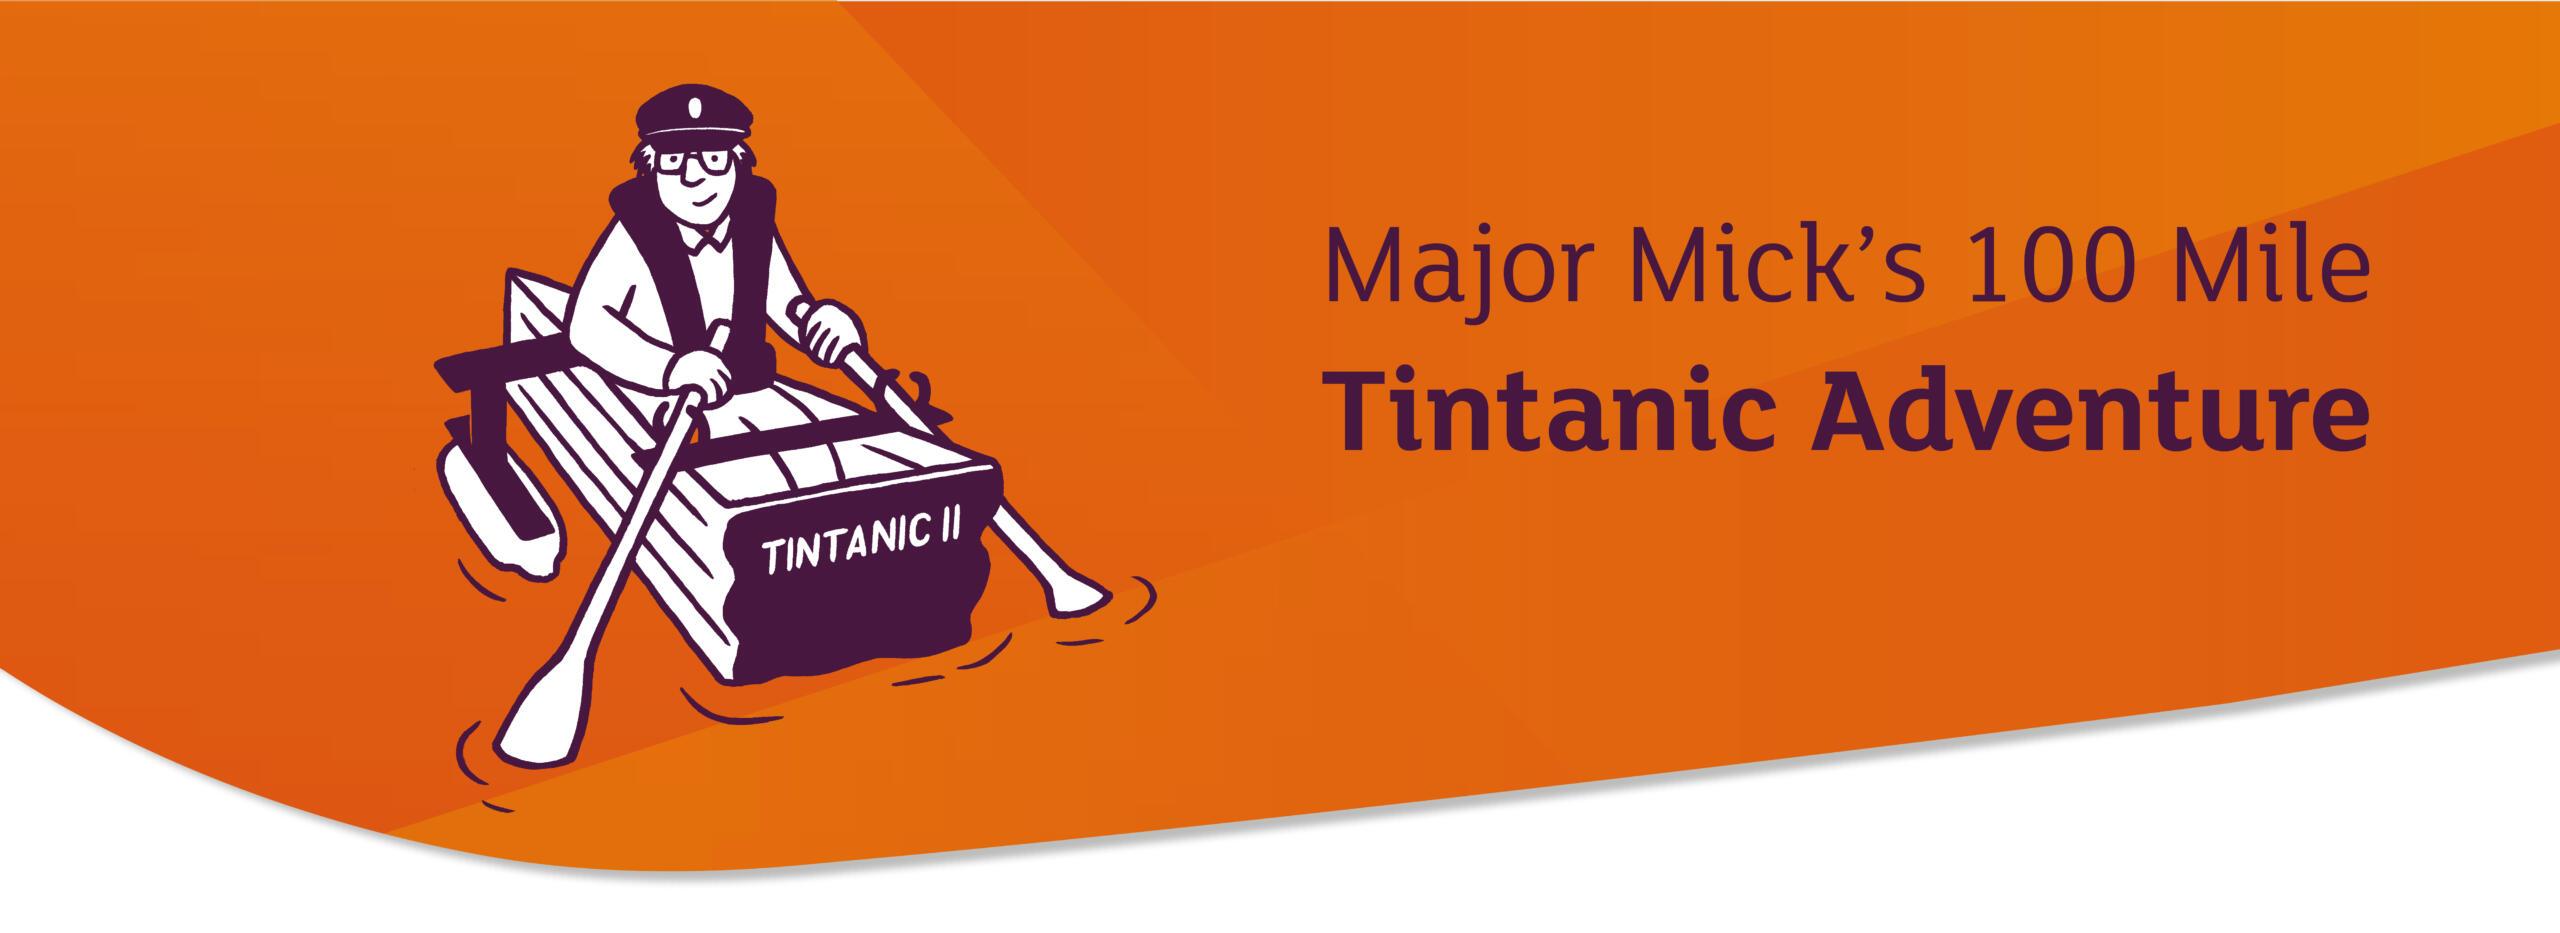 Major Mick's 100 mile Tintanic Adventure